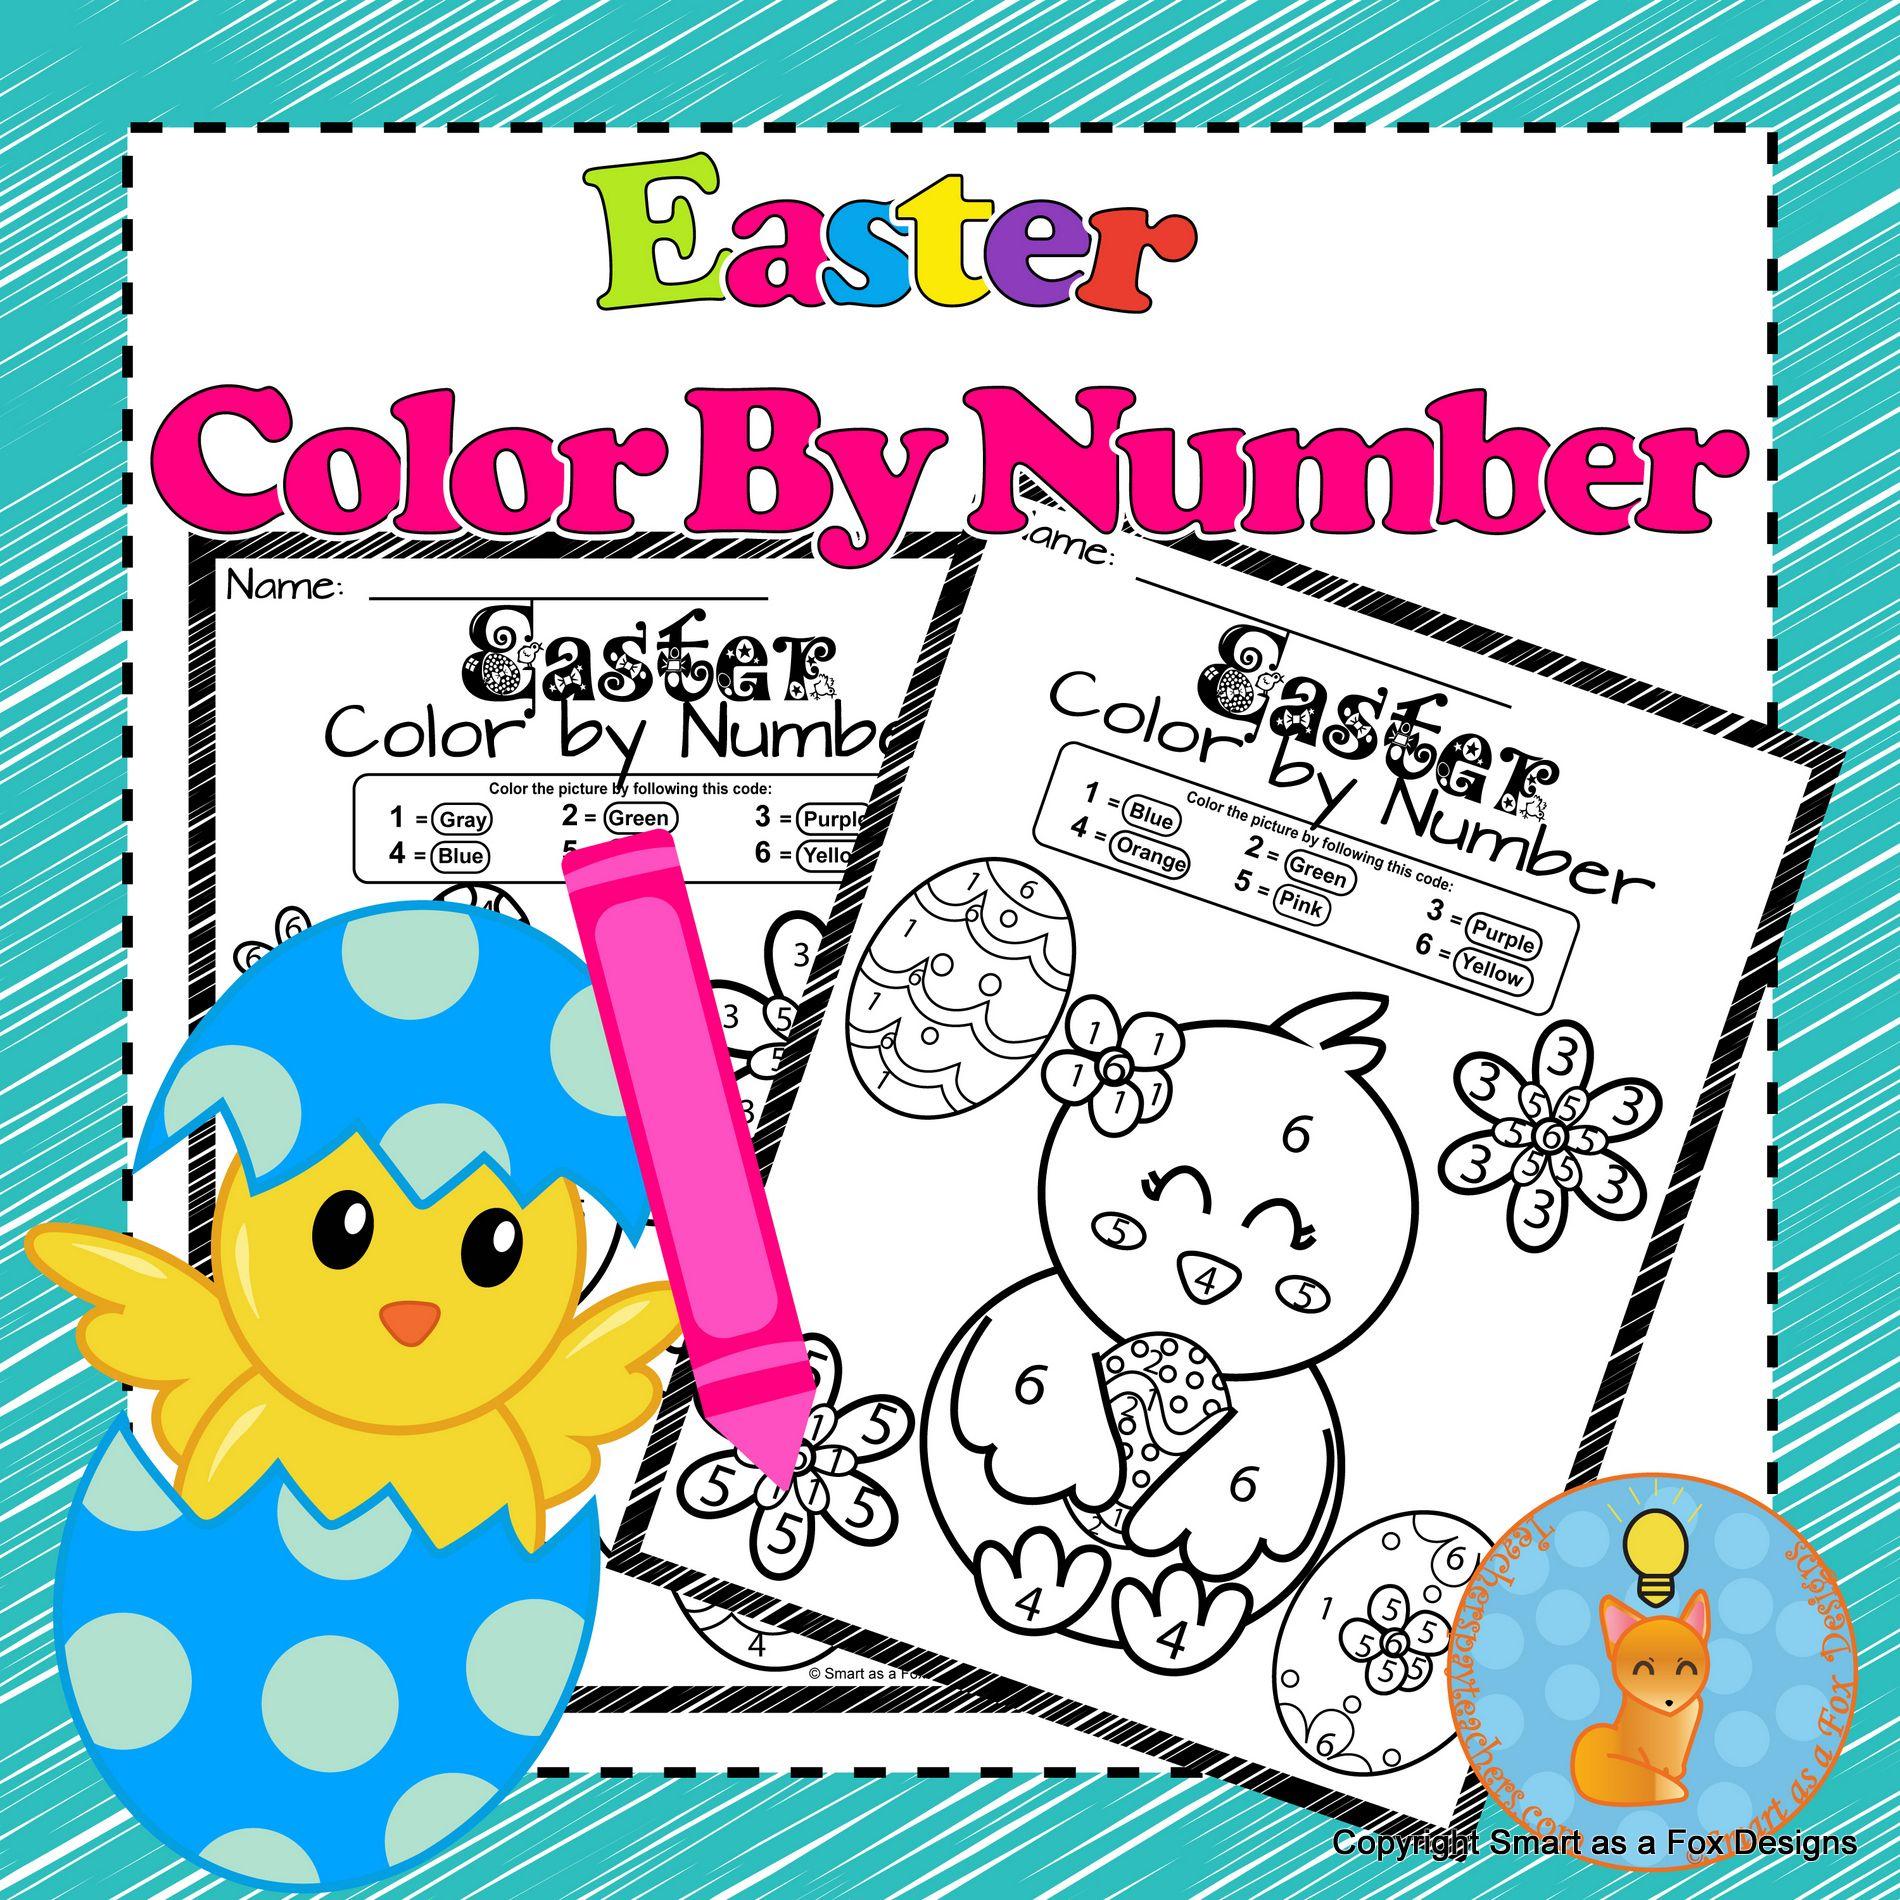 Color By Number Easter Worksheets